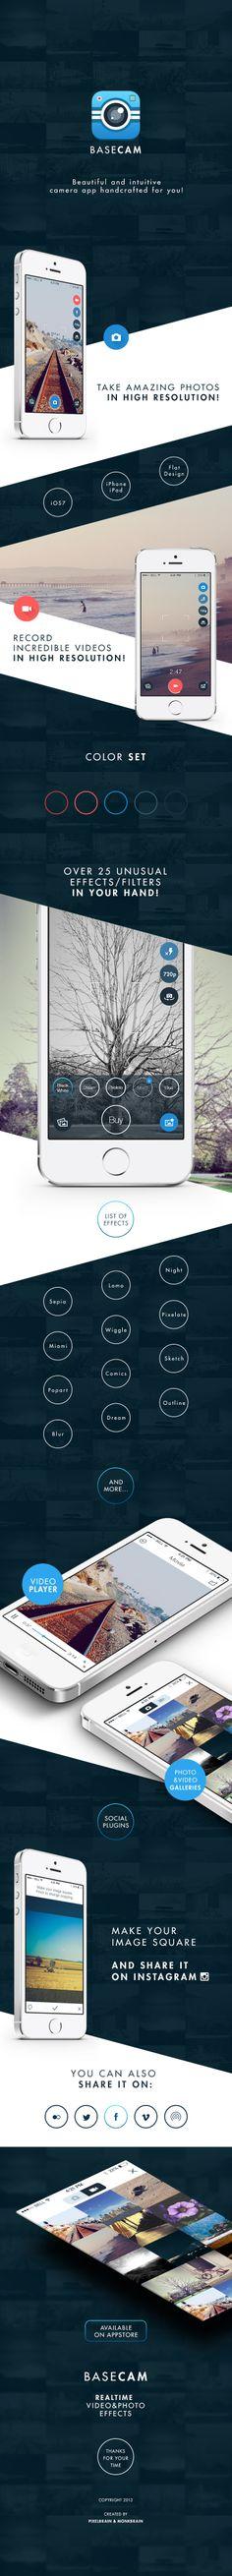 Basecam - Intuitive Camera App by Monkbrain (via Creattica)